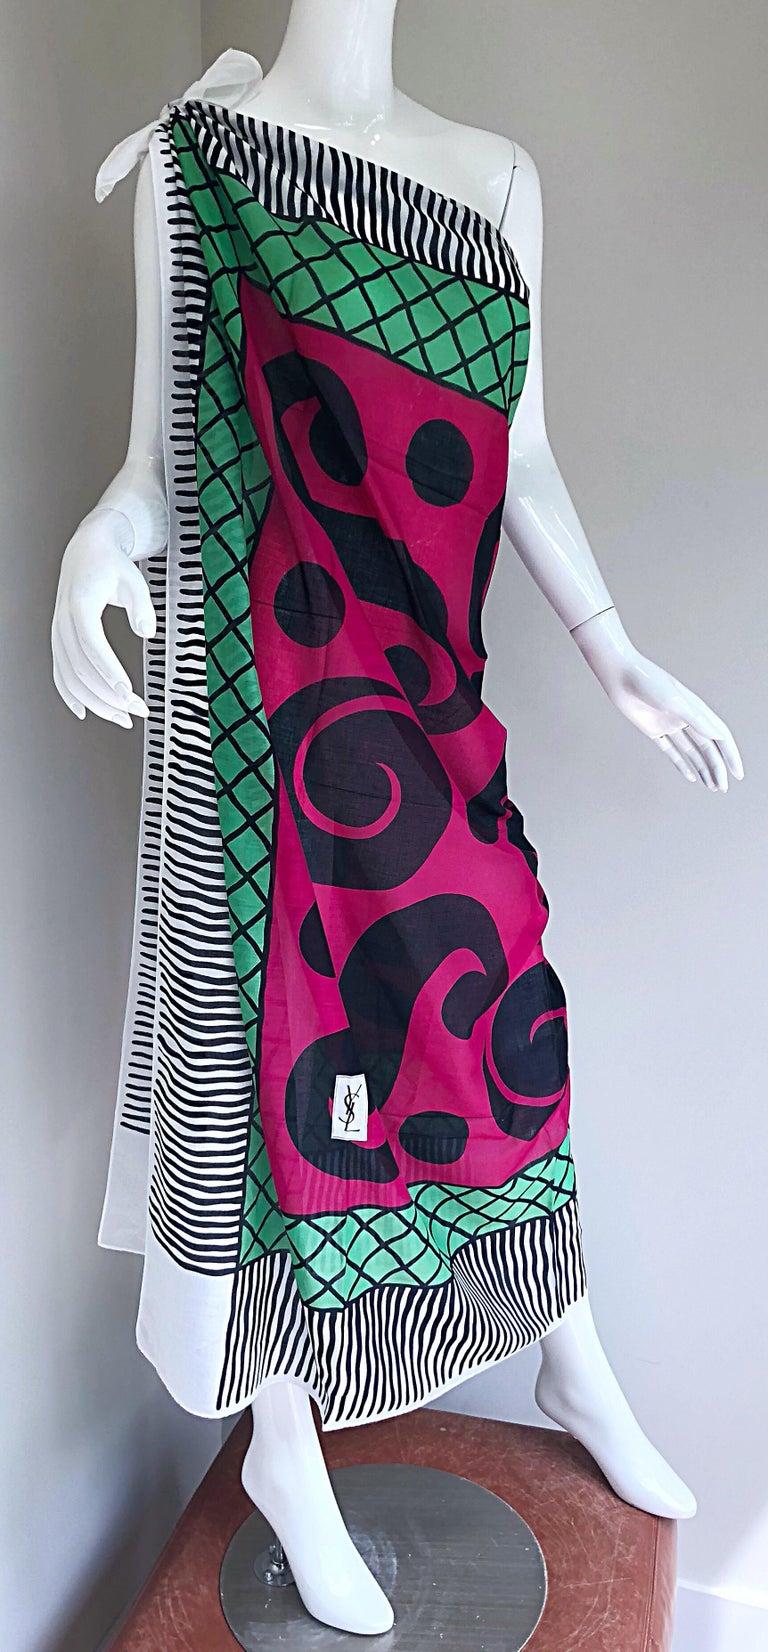 Vintage Yves Saint Laurent Iconic YSL Jumbo 55 x 55 Cotton Shawl Parero Dress For Sale 5